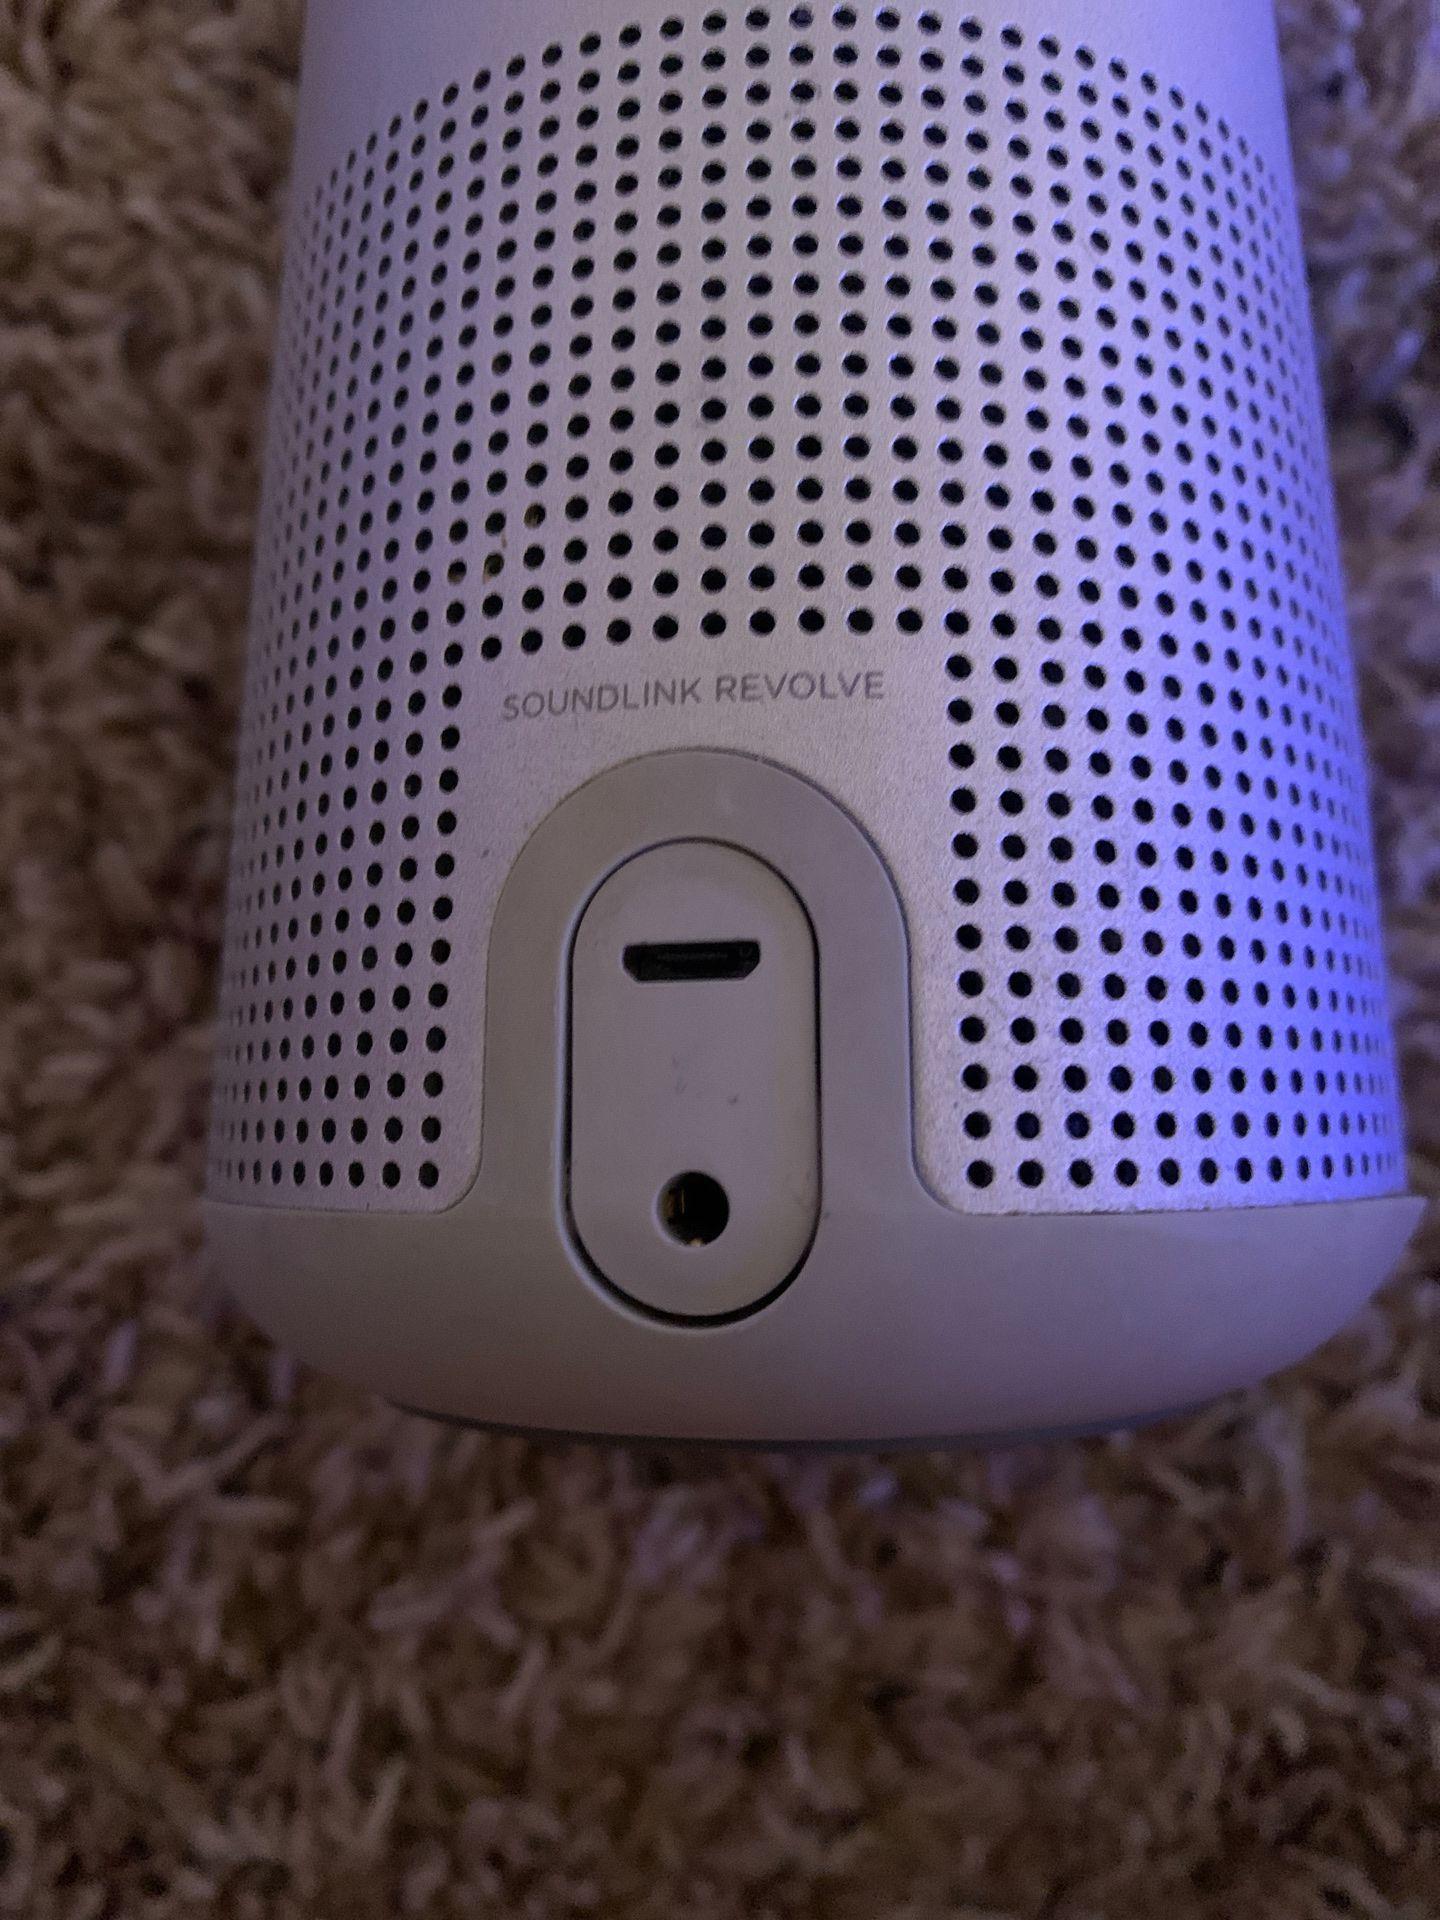 bose revolve speaker gray lux